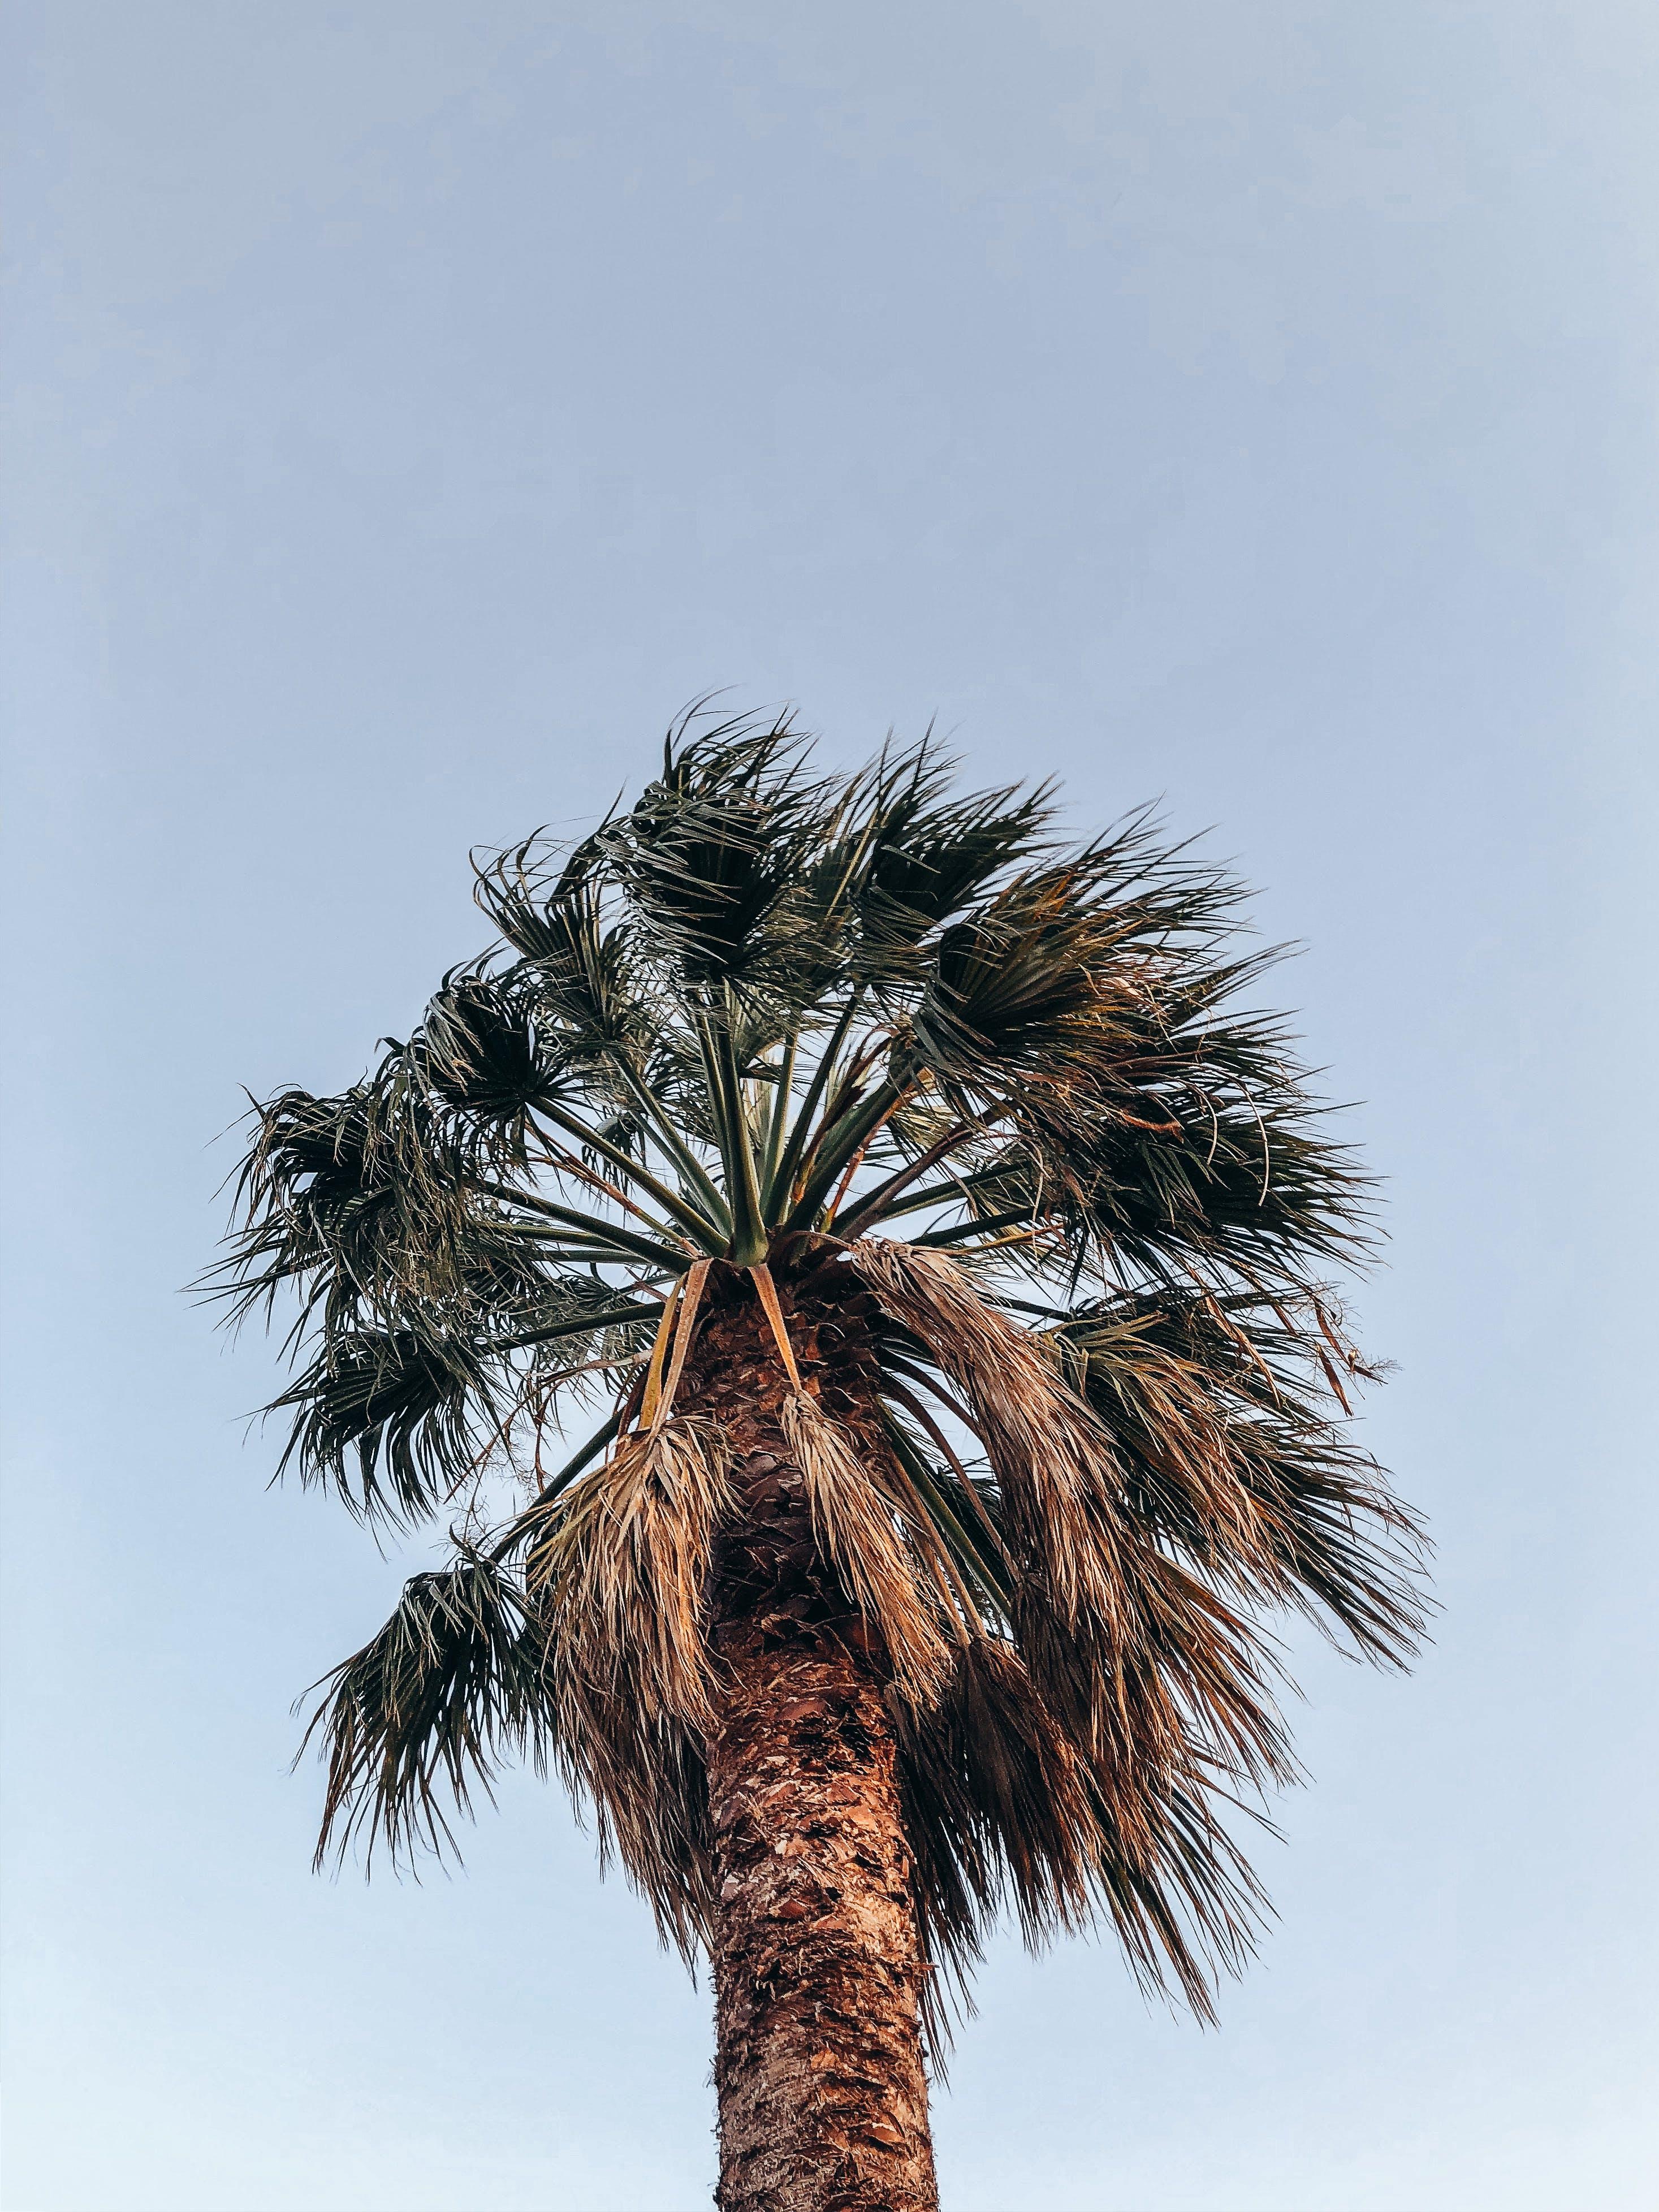 Gratis arkivbilde med himmel, klar himmel, kokosnøttre, lav-vinklet fotografering